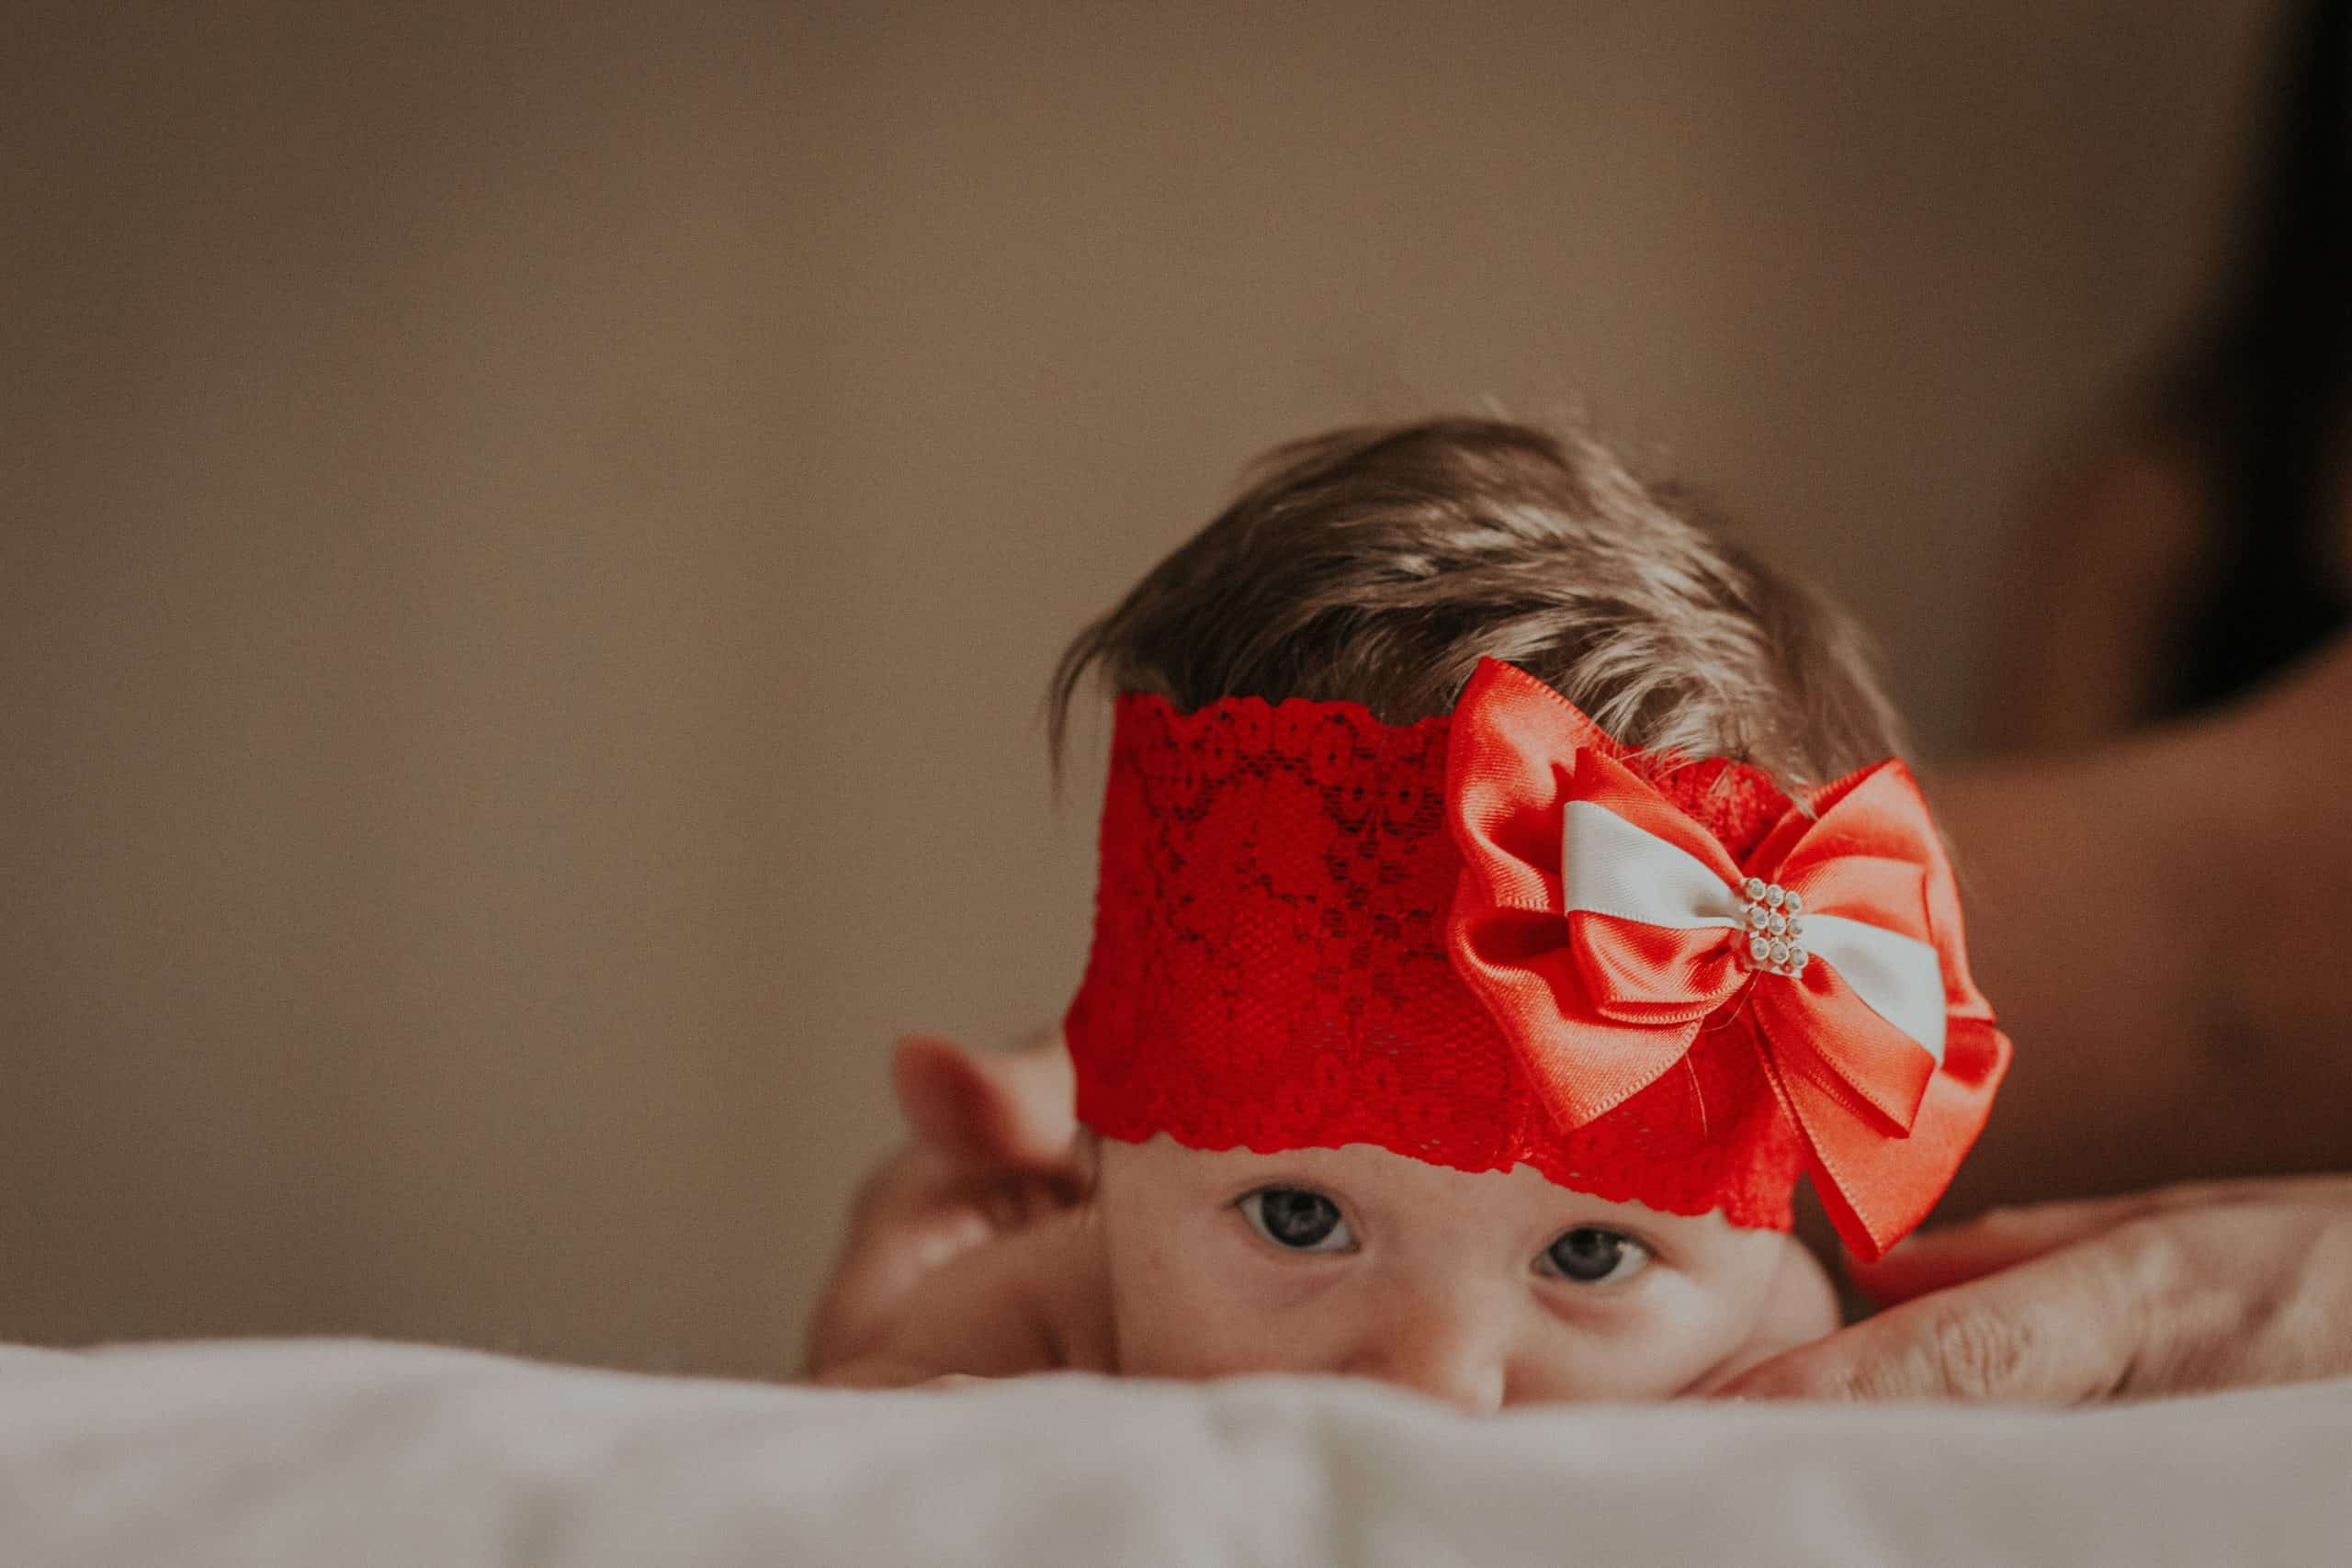 Best Newborn Photography course tutorial class certification training online